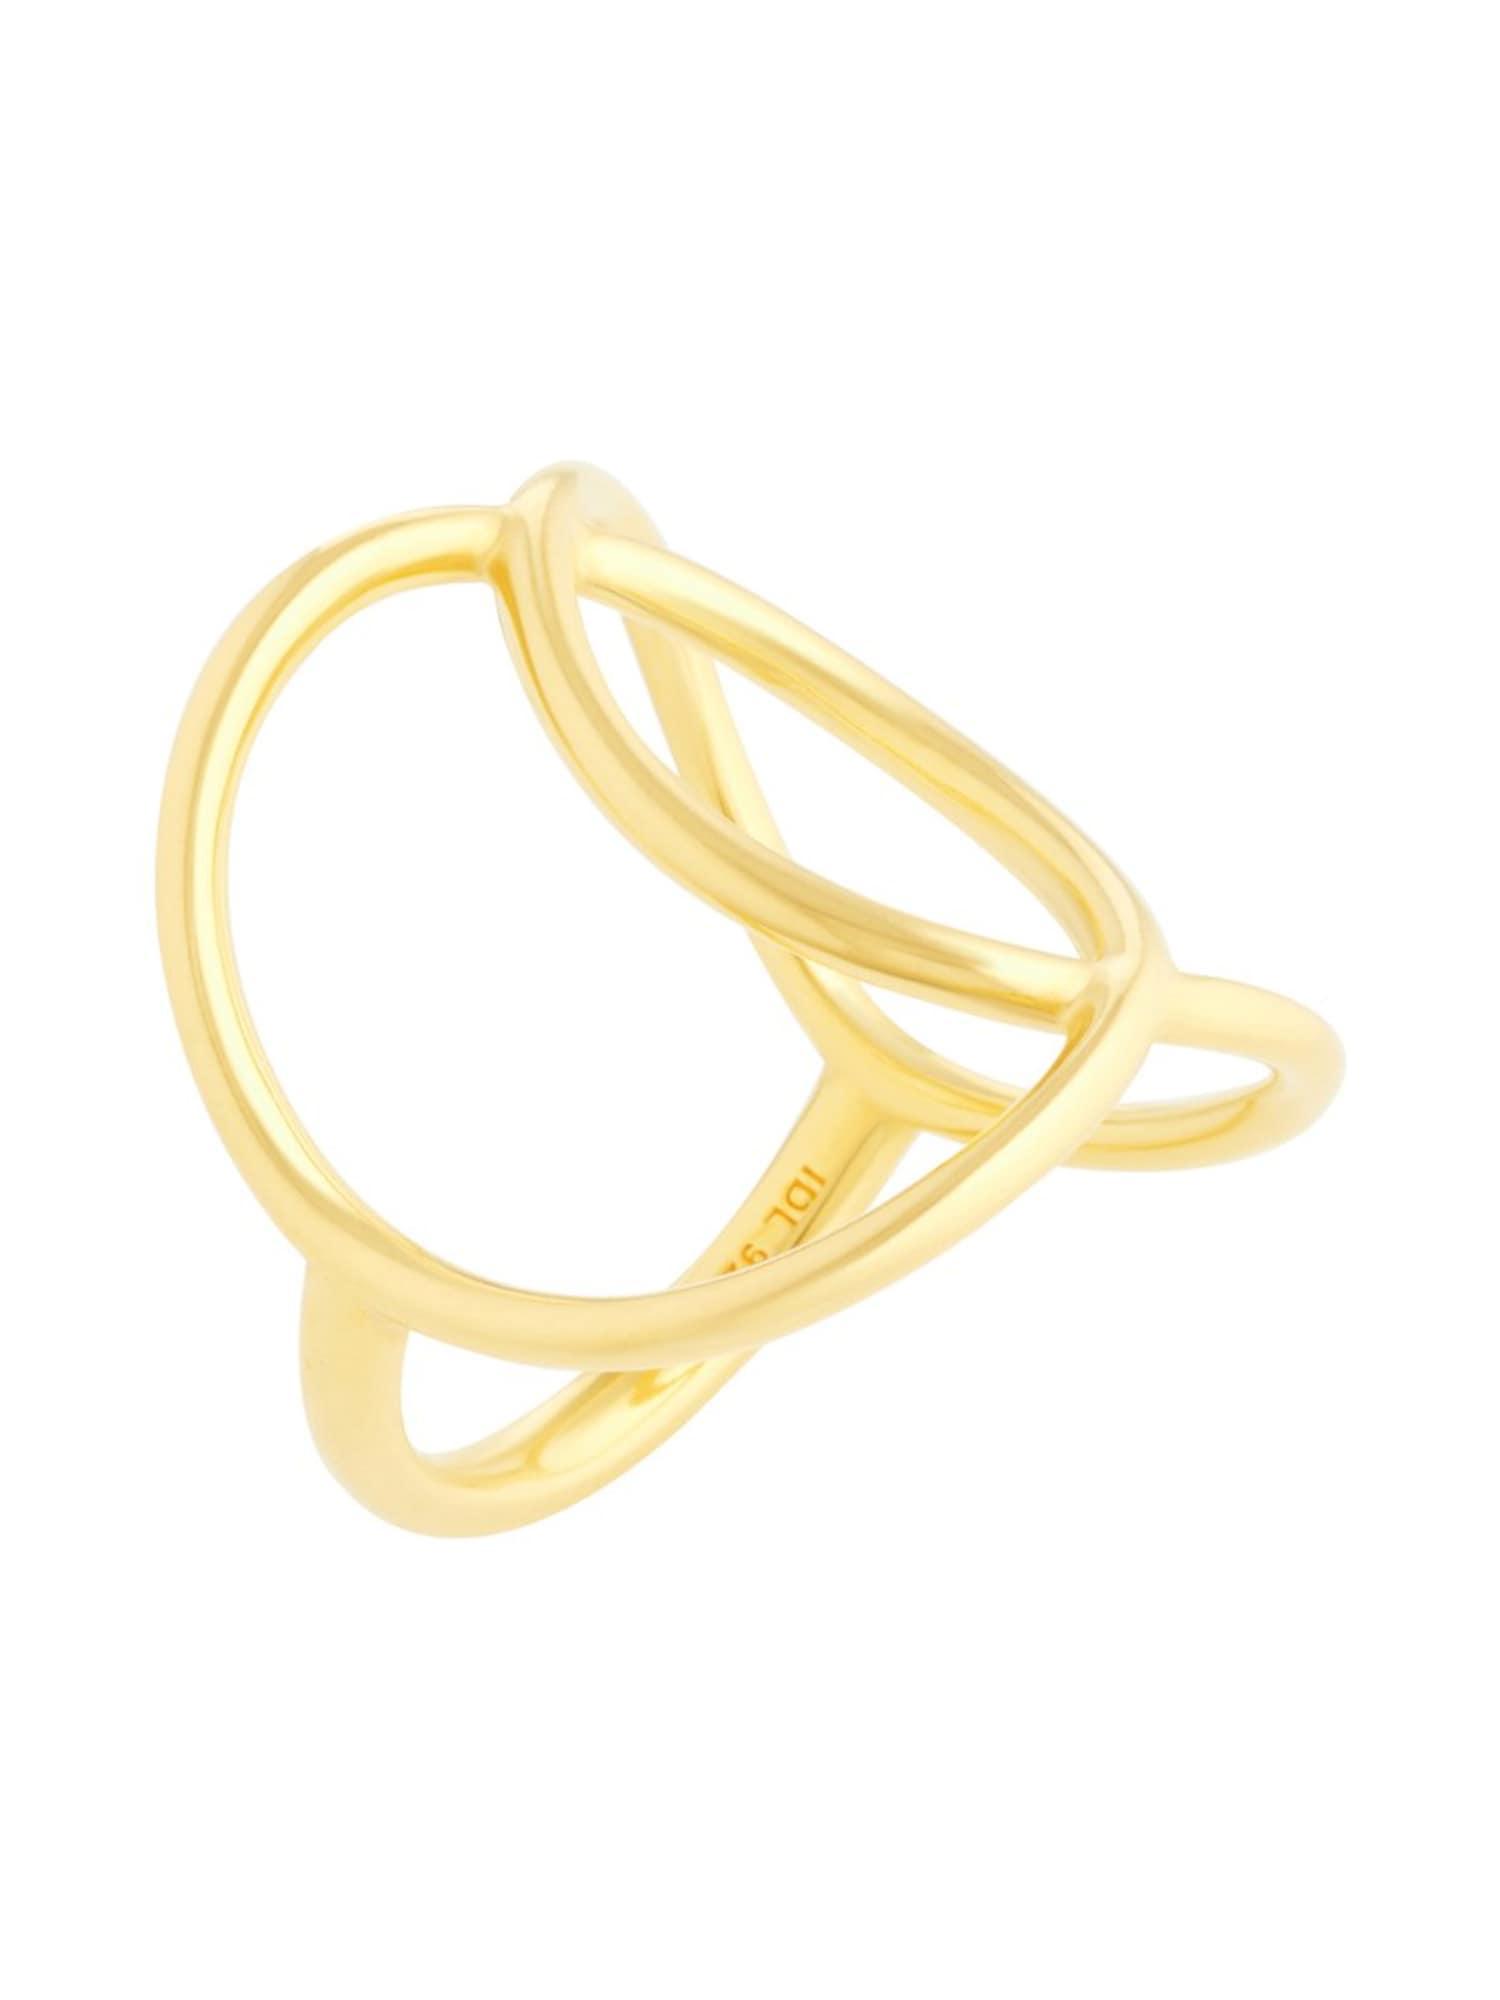 Damen ID Fine Ring 'Double Sphere' gold | 05704465109357